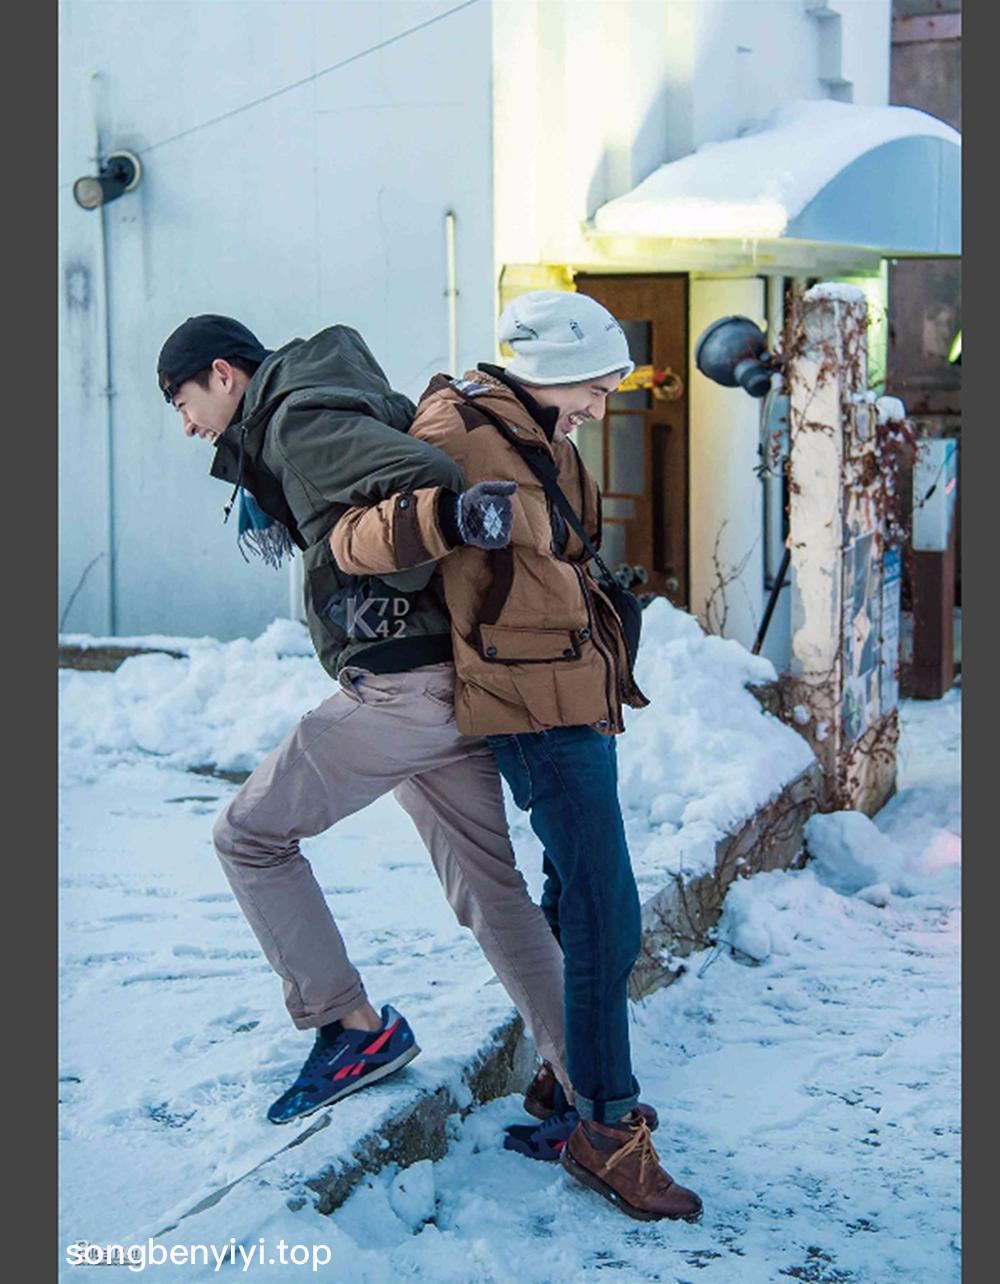 WHOSEMAN NO.13阿部&安東尼-追尋白色戀人的浪漫【藝術全見版】【ebook】-24.png